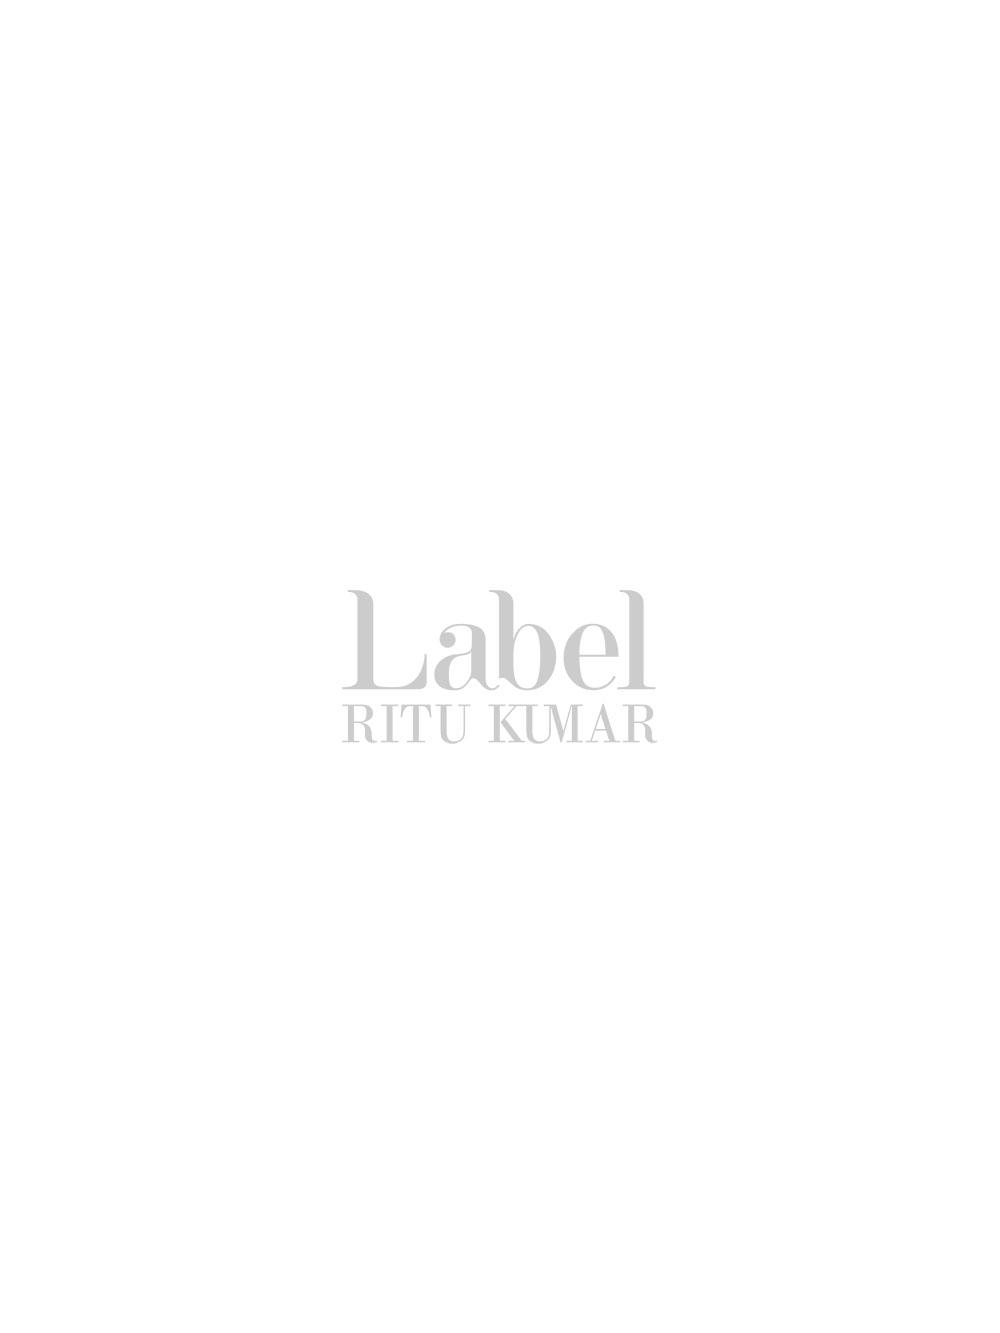 Gold Embroidered Designer Off White Short Dress